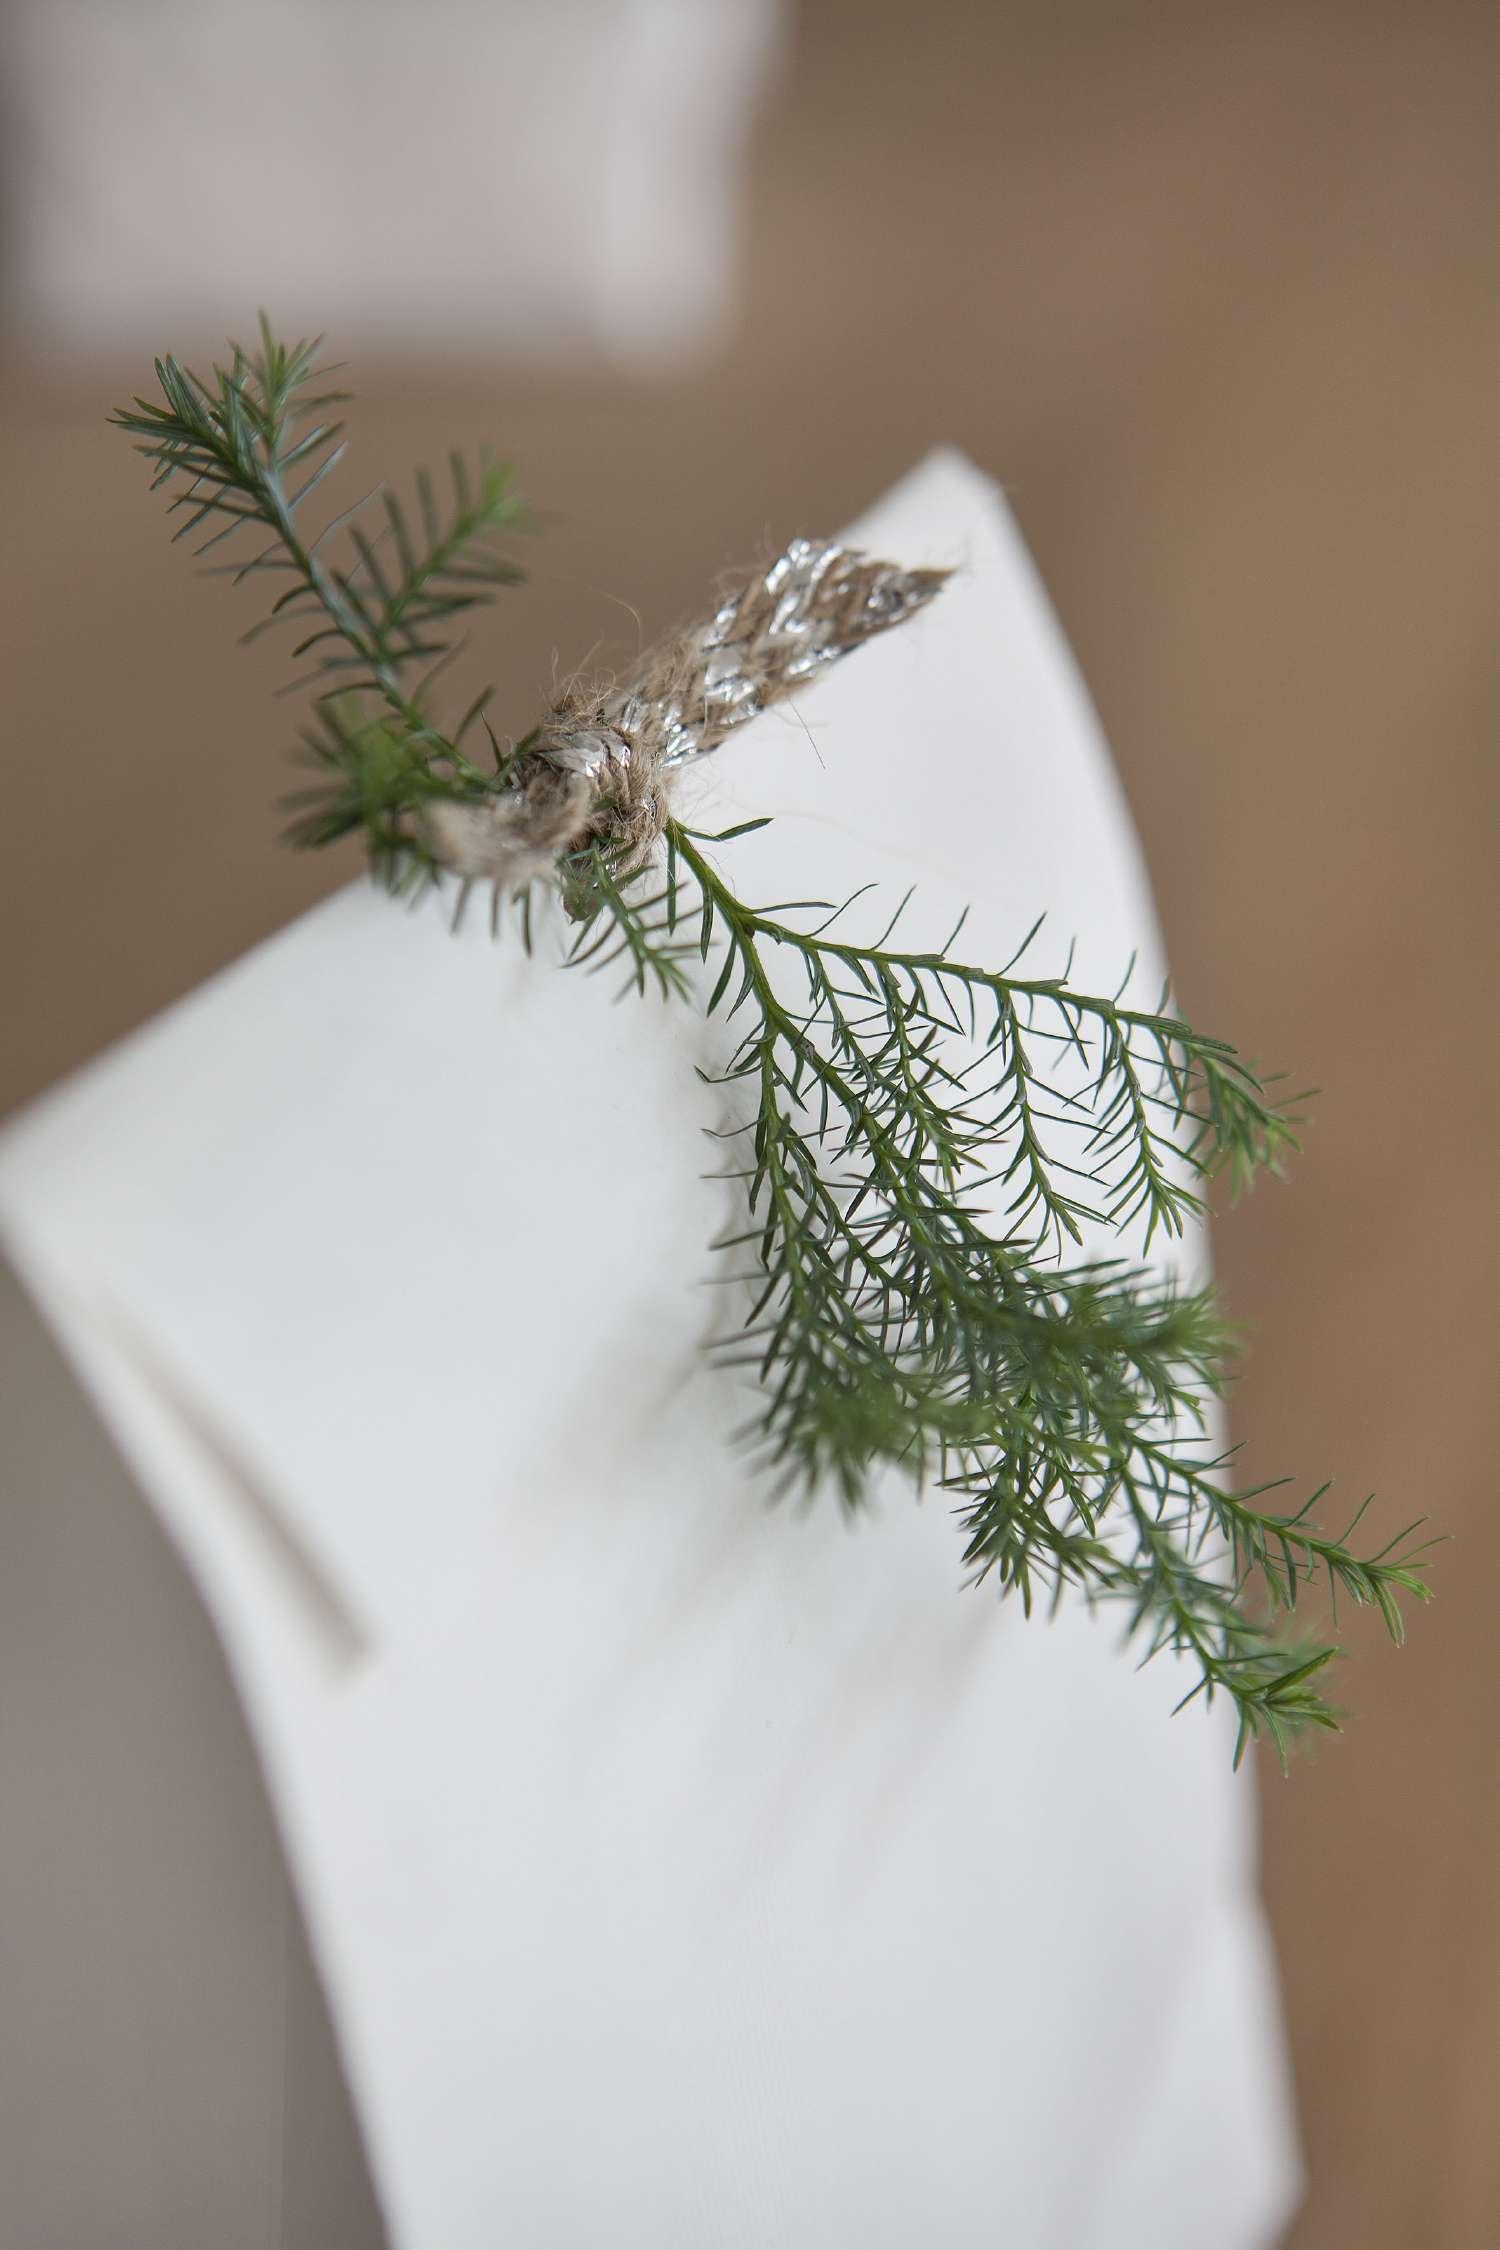 01 Jul - julegave med grønt